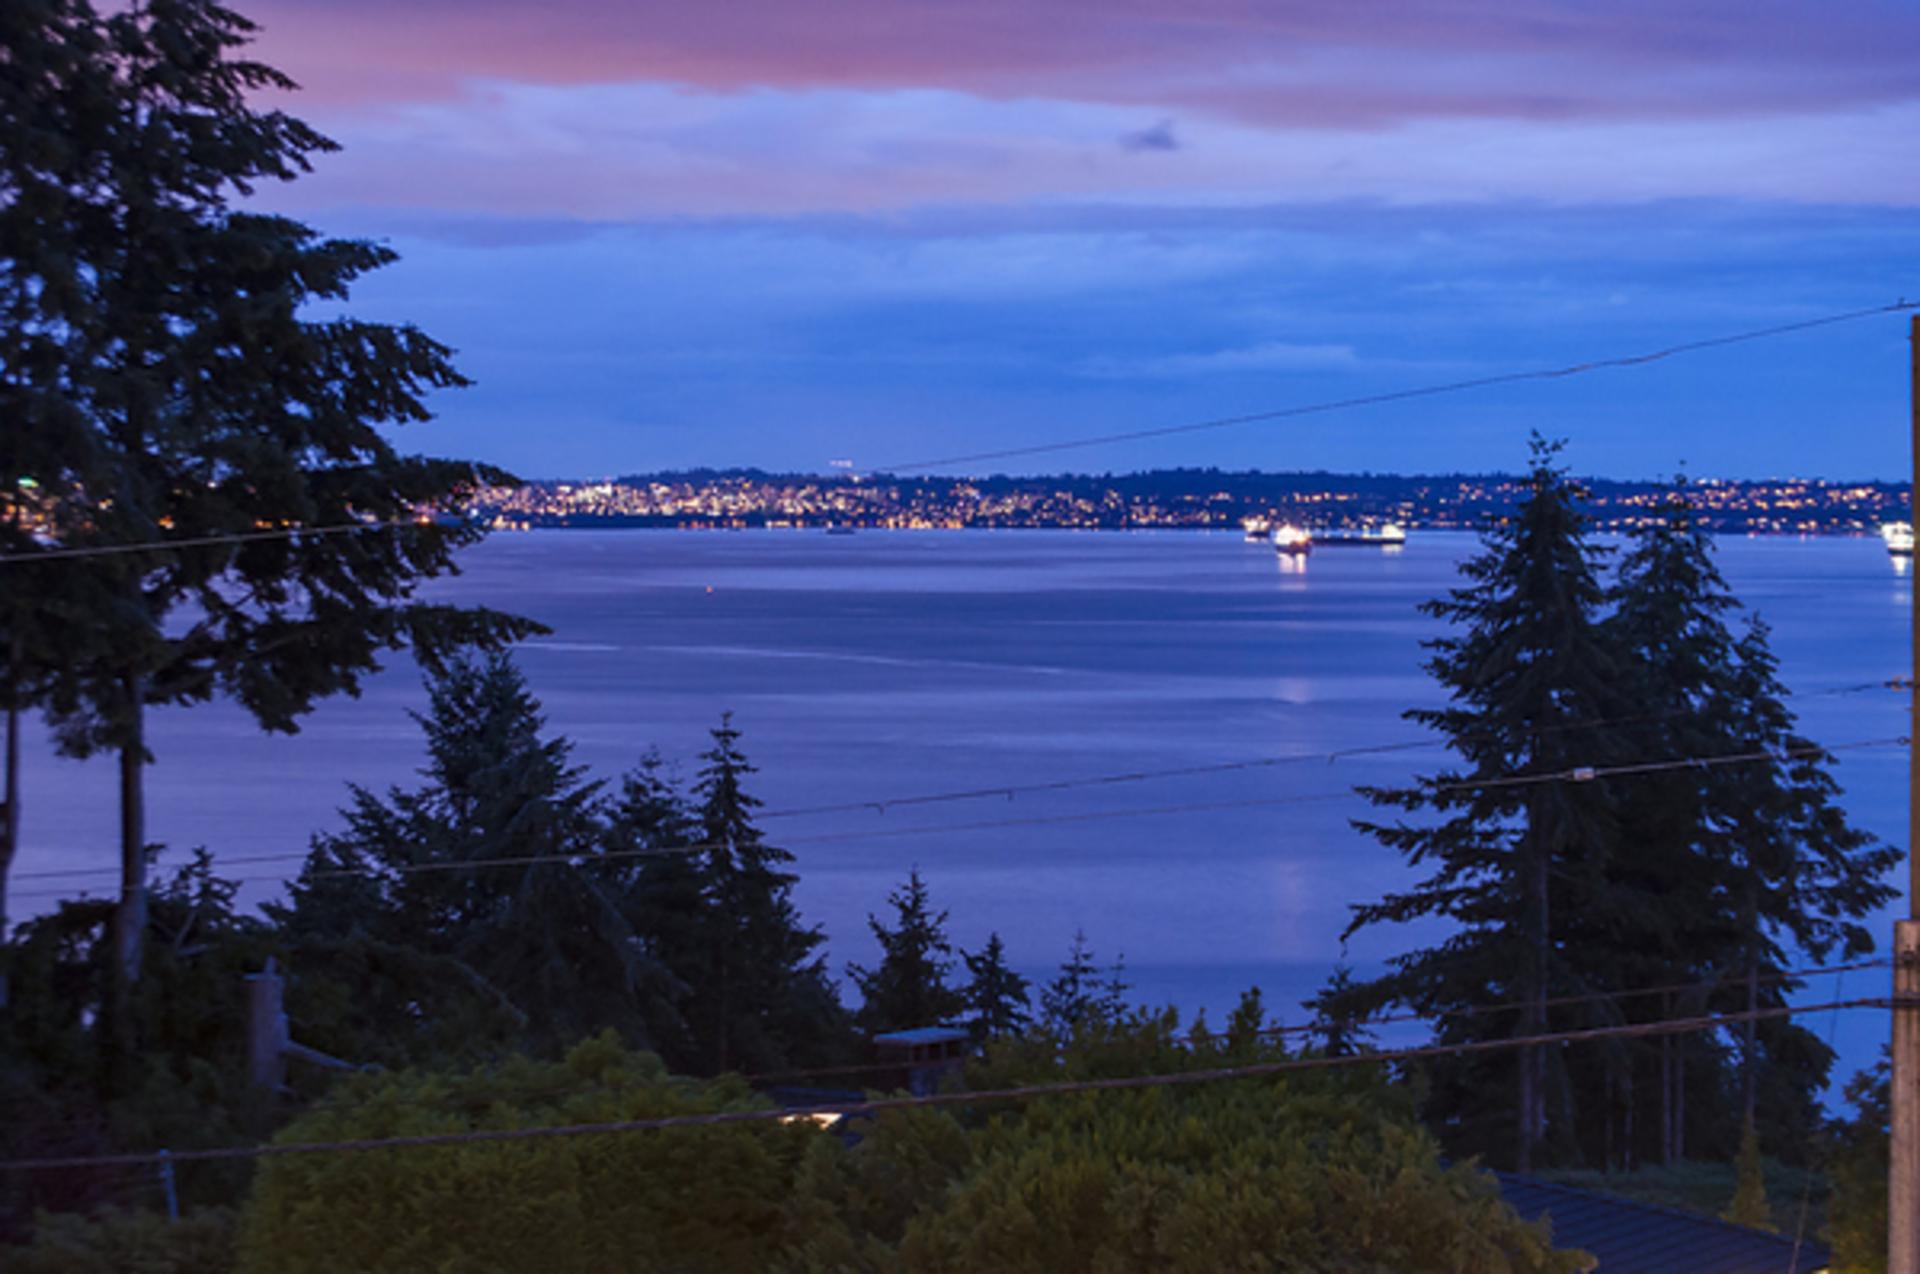 038 at 4113 Bayridge, Bayridge, West Vancouver